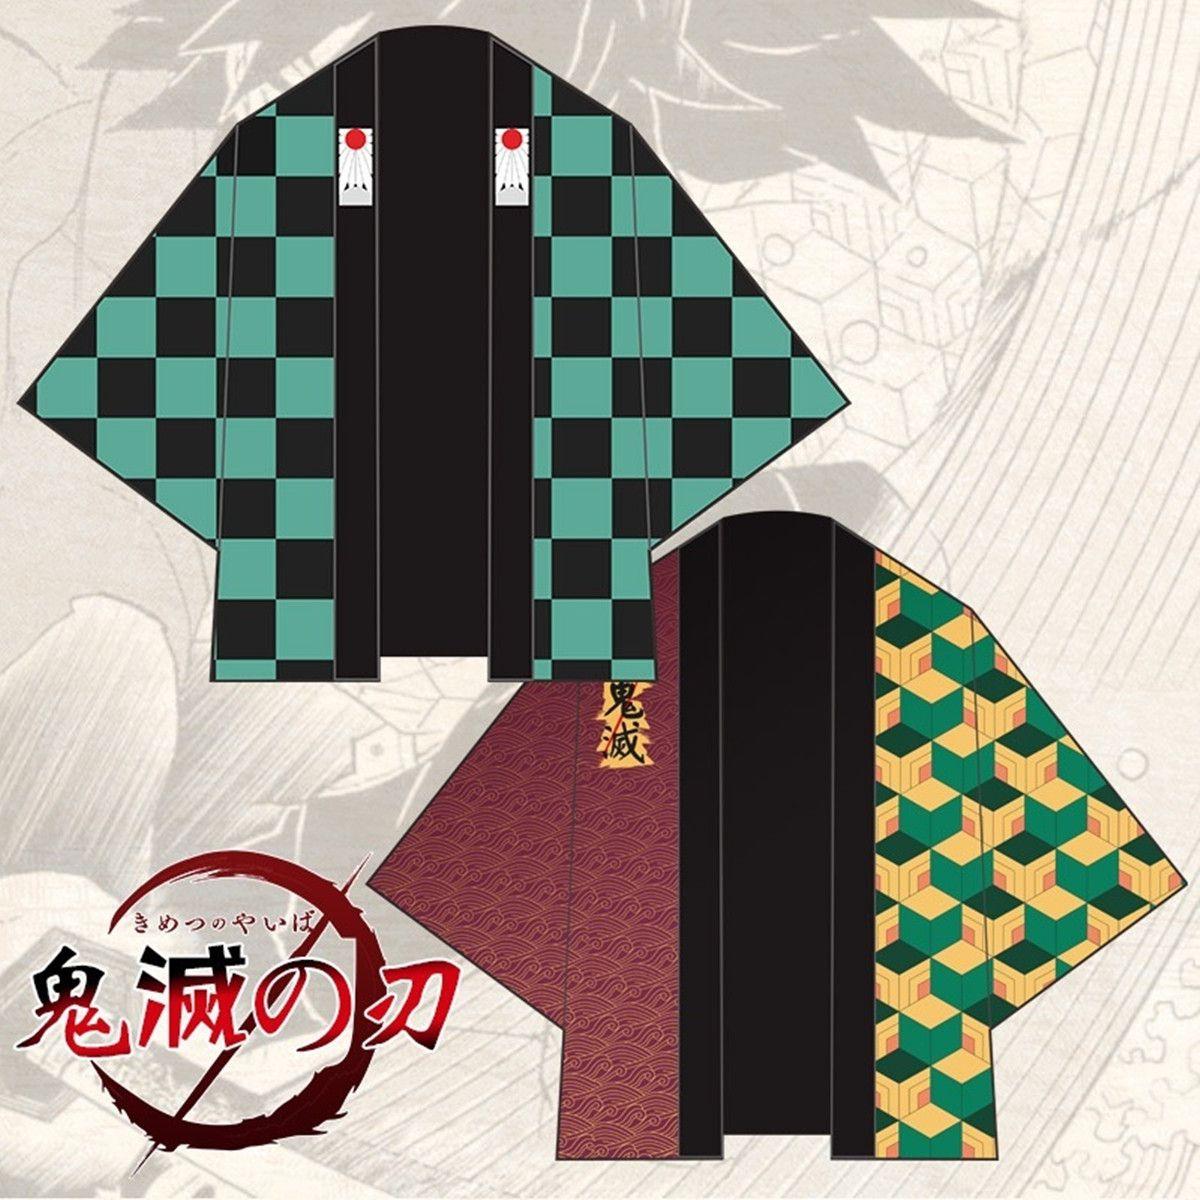 Cadılar Bayramı Anime Kamado Tanjirou Tomioka Giyuu Cosplay Kostüm Demon Slayer Suit Haori Cape Parti Kimono Cloak